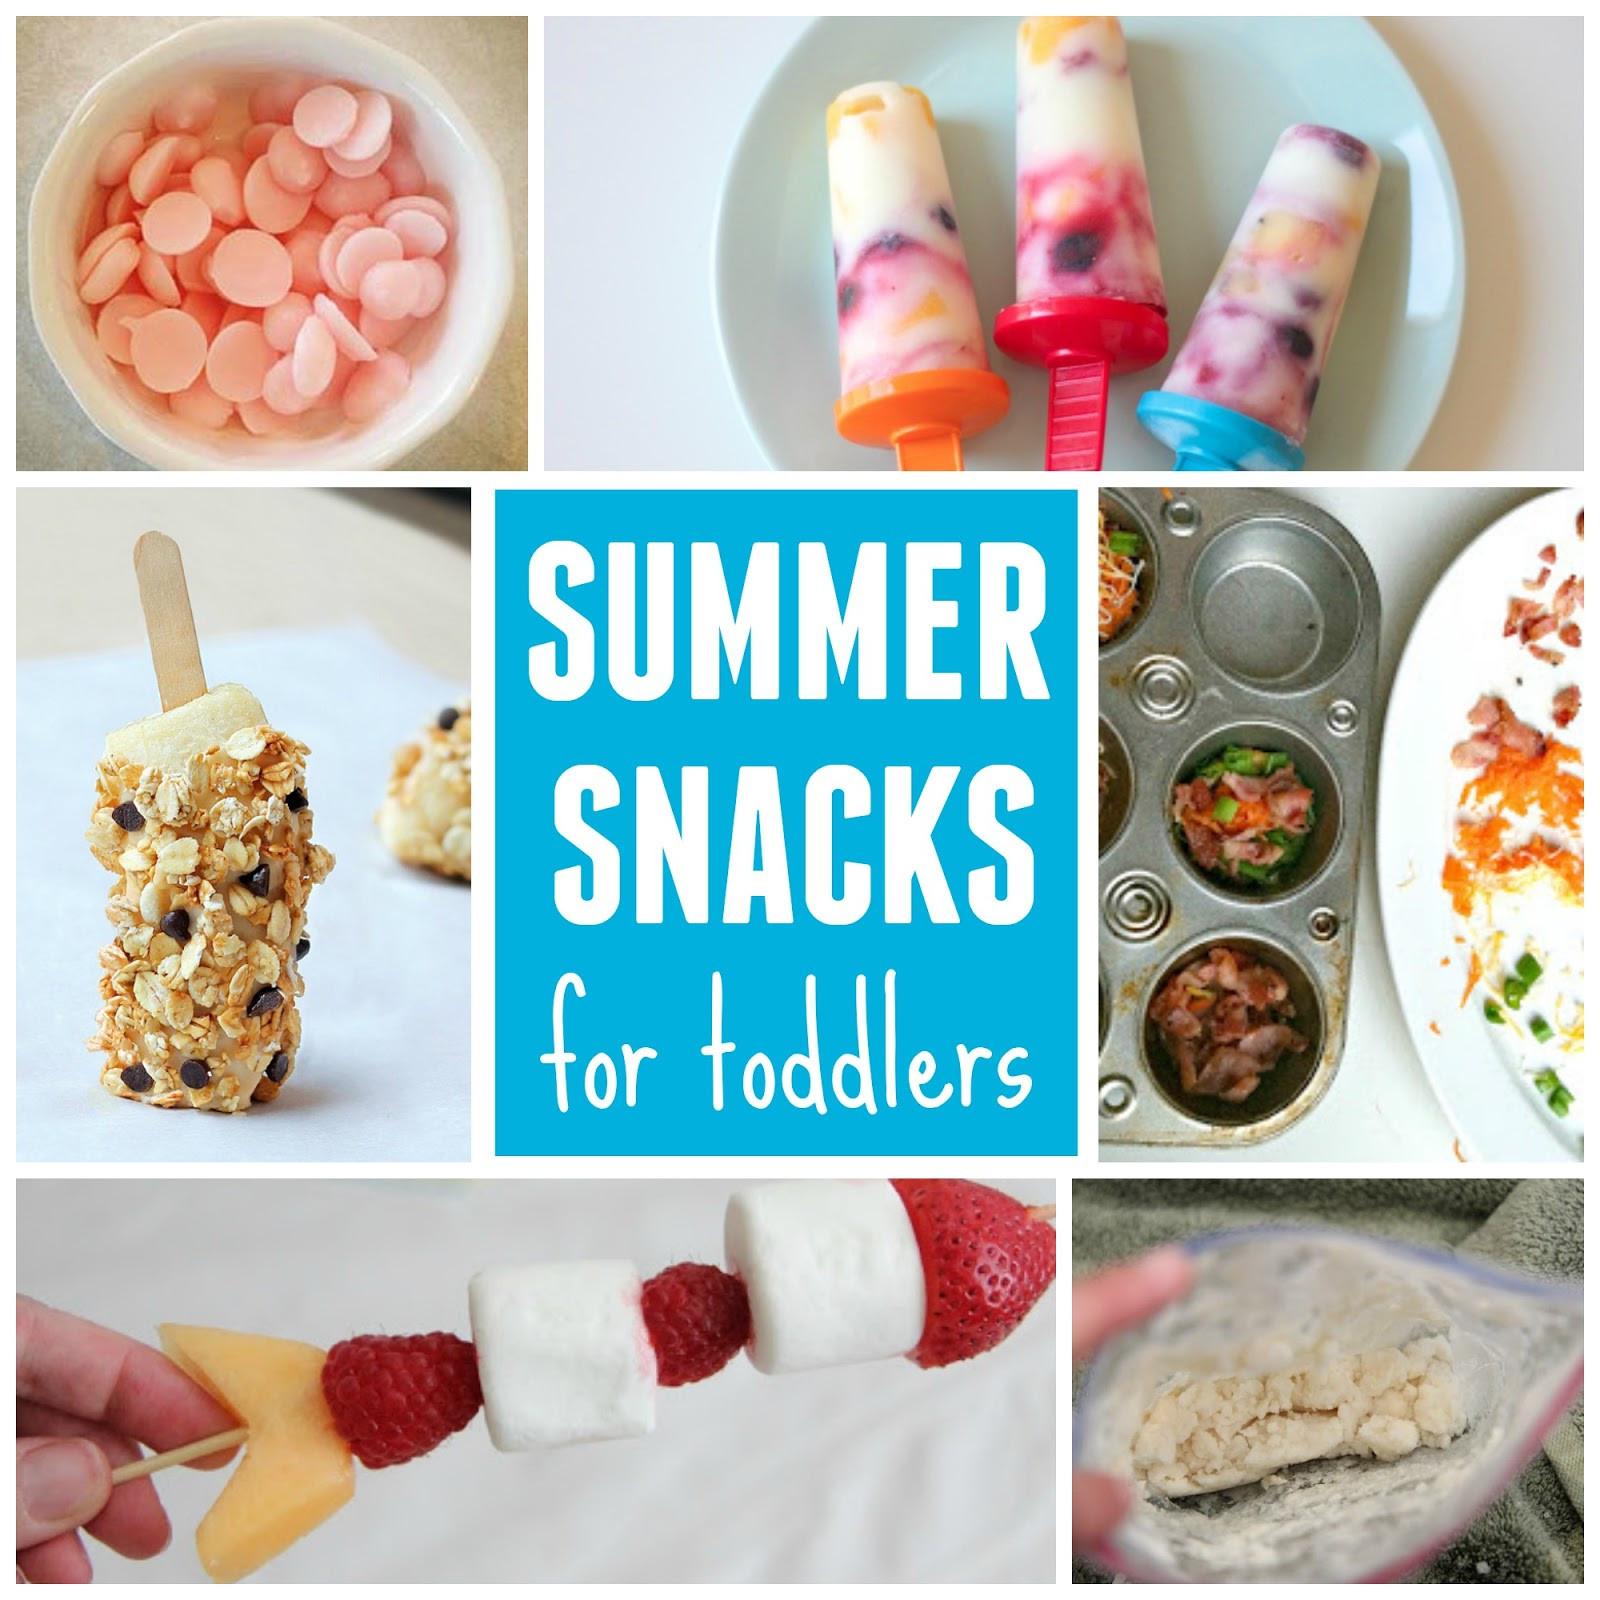 Summertime Snacks Recipe  Toddler Approved 10 Summer Snacks for Toddlers